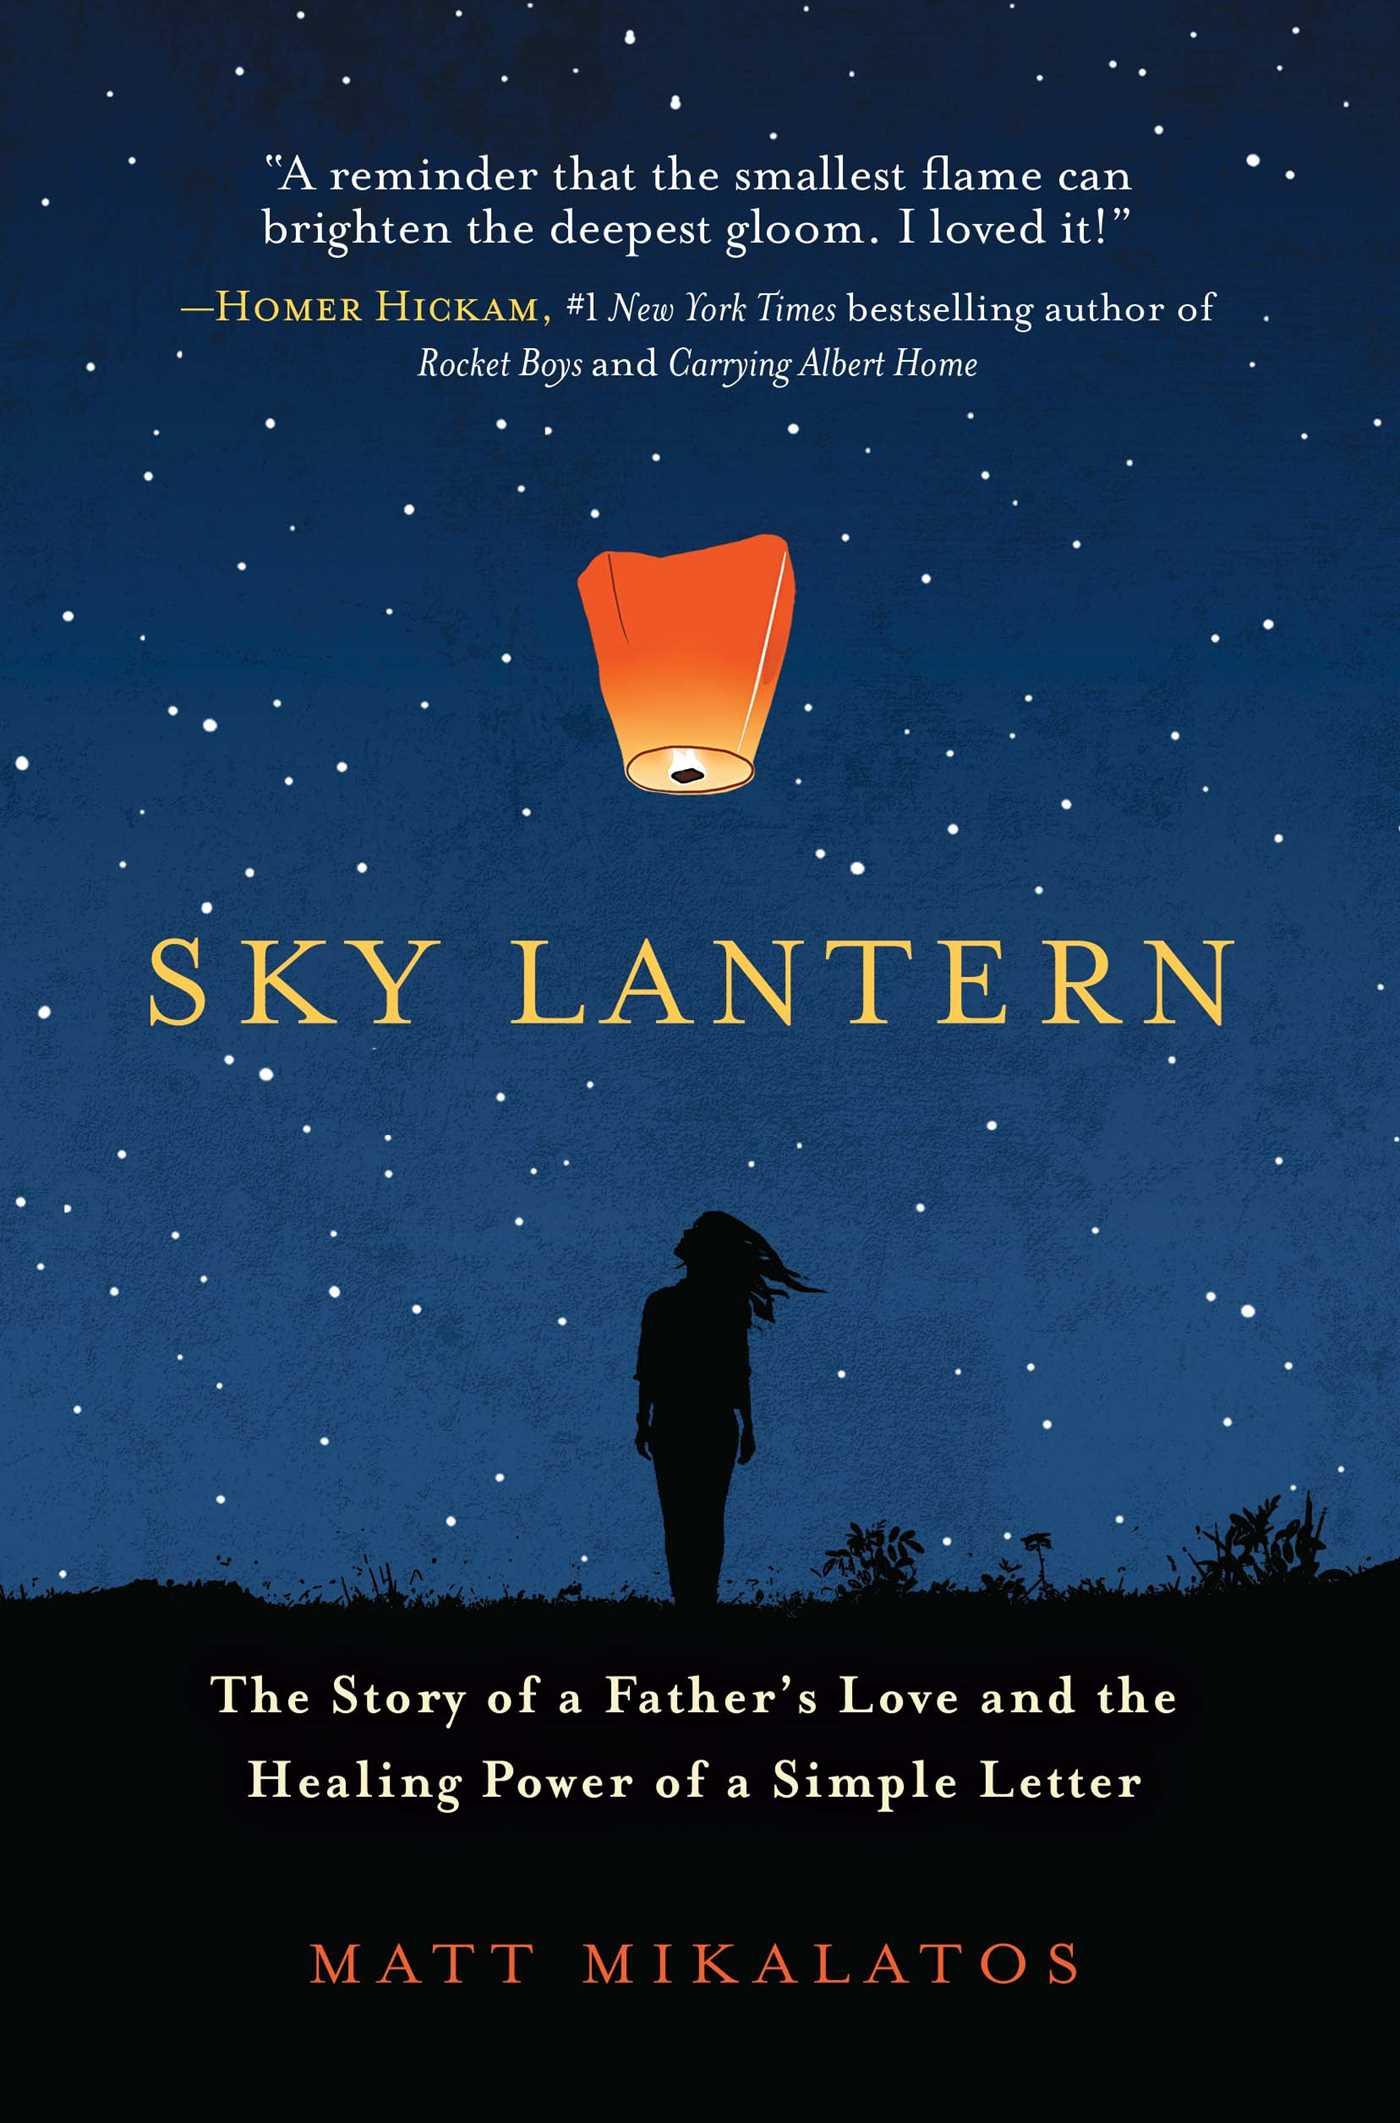 Sky lantern 9781501123504 hr